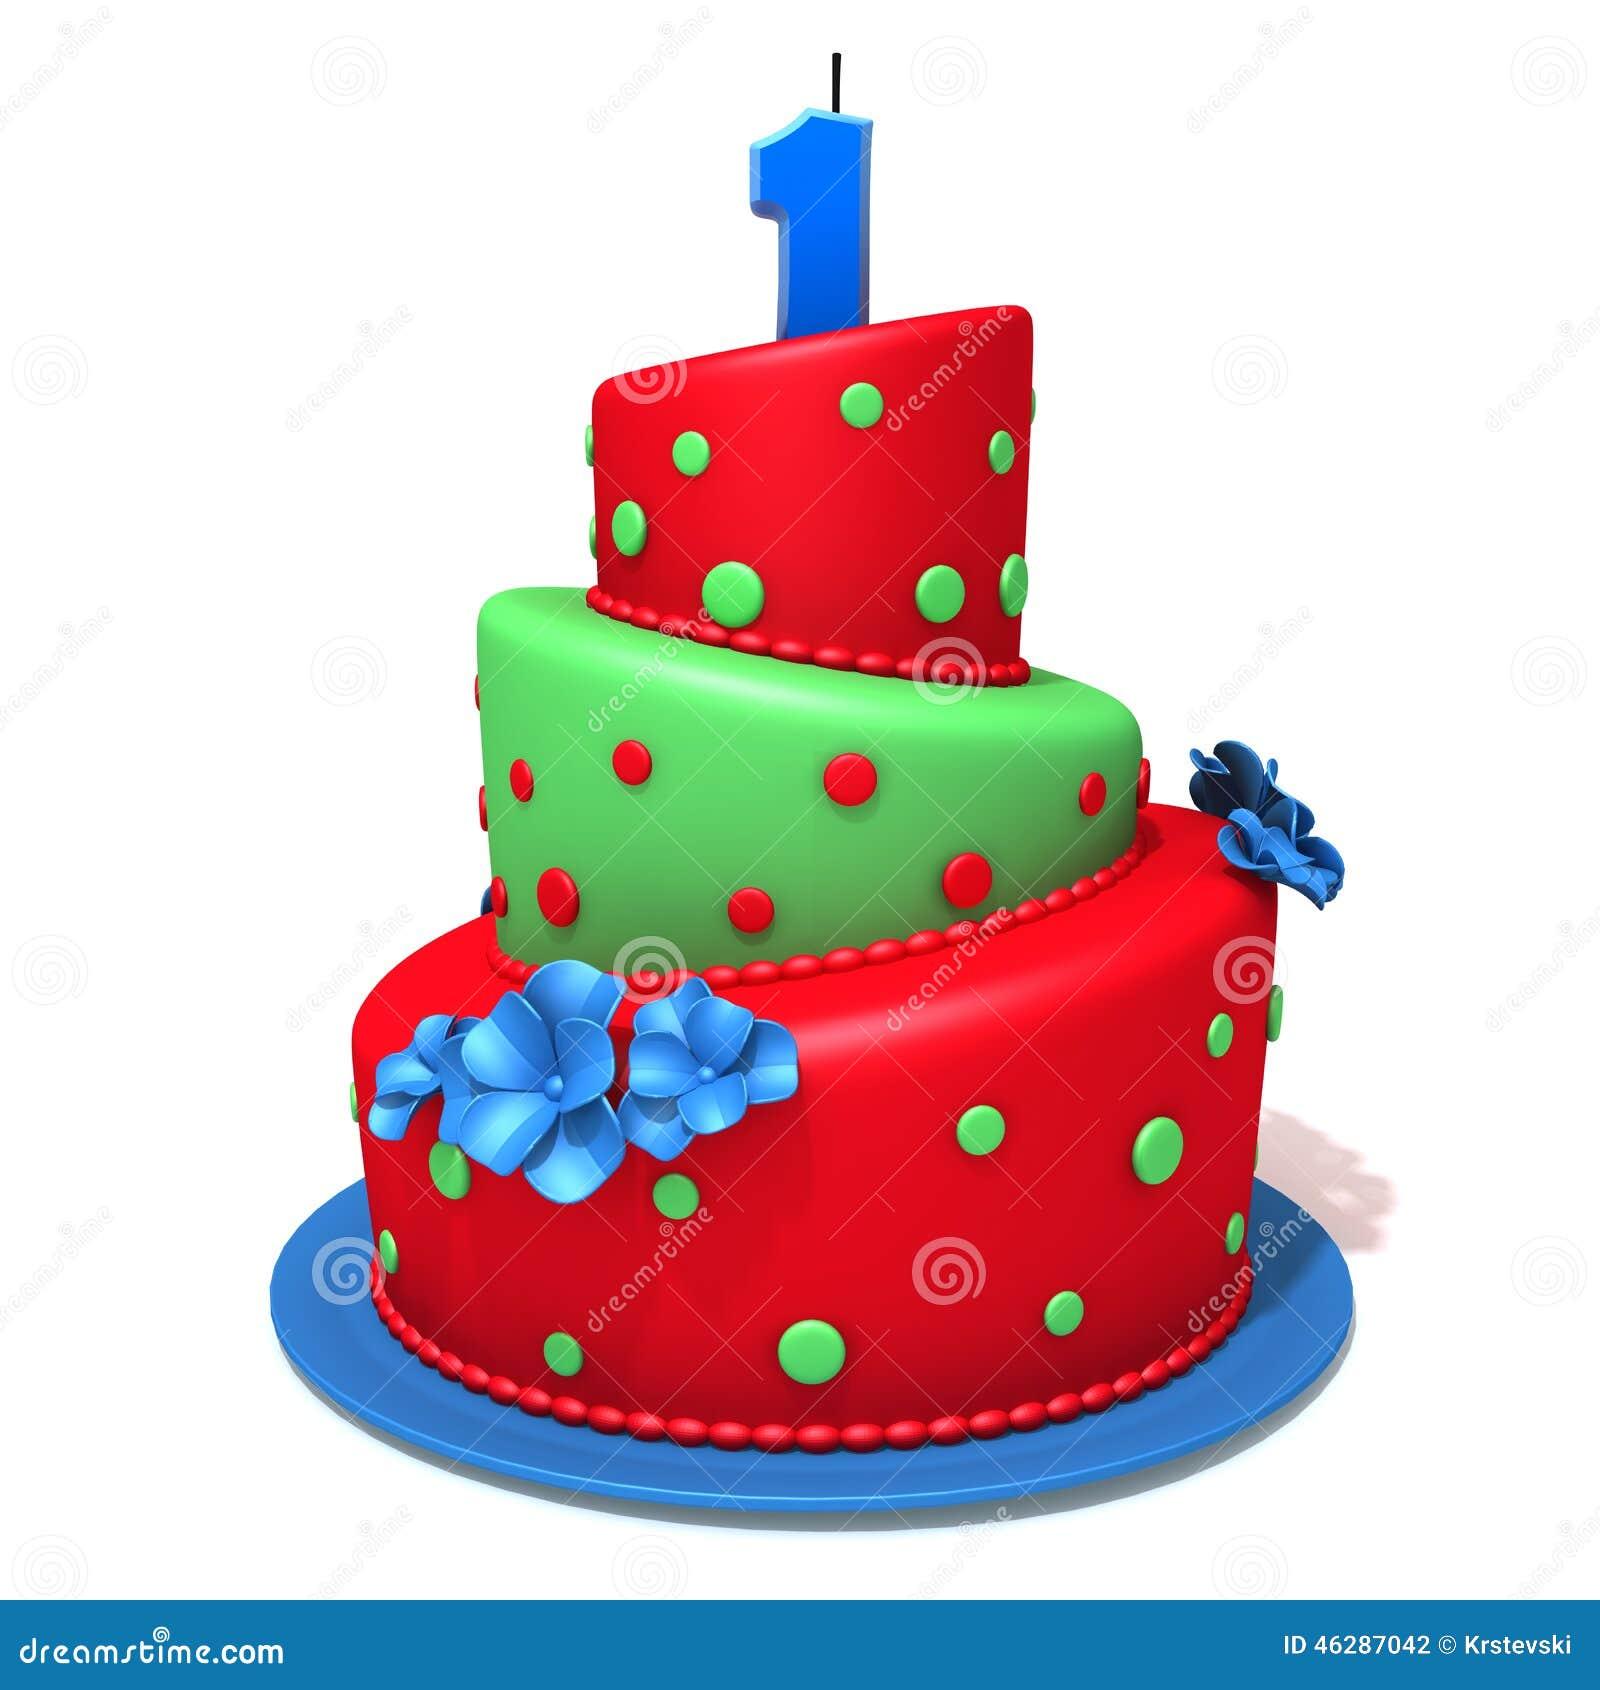 Sugar Free Birthday Cake For  Year Old